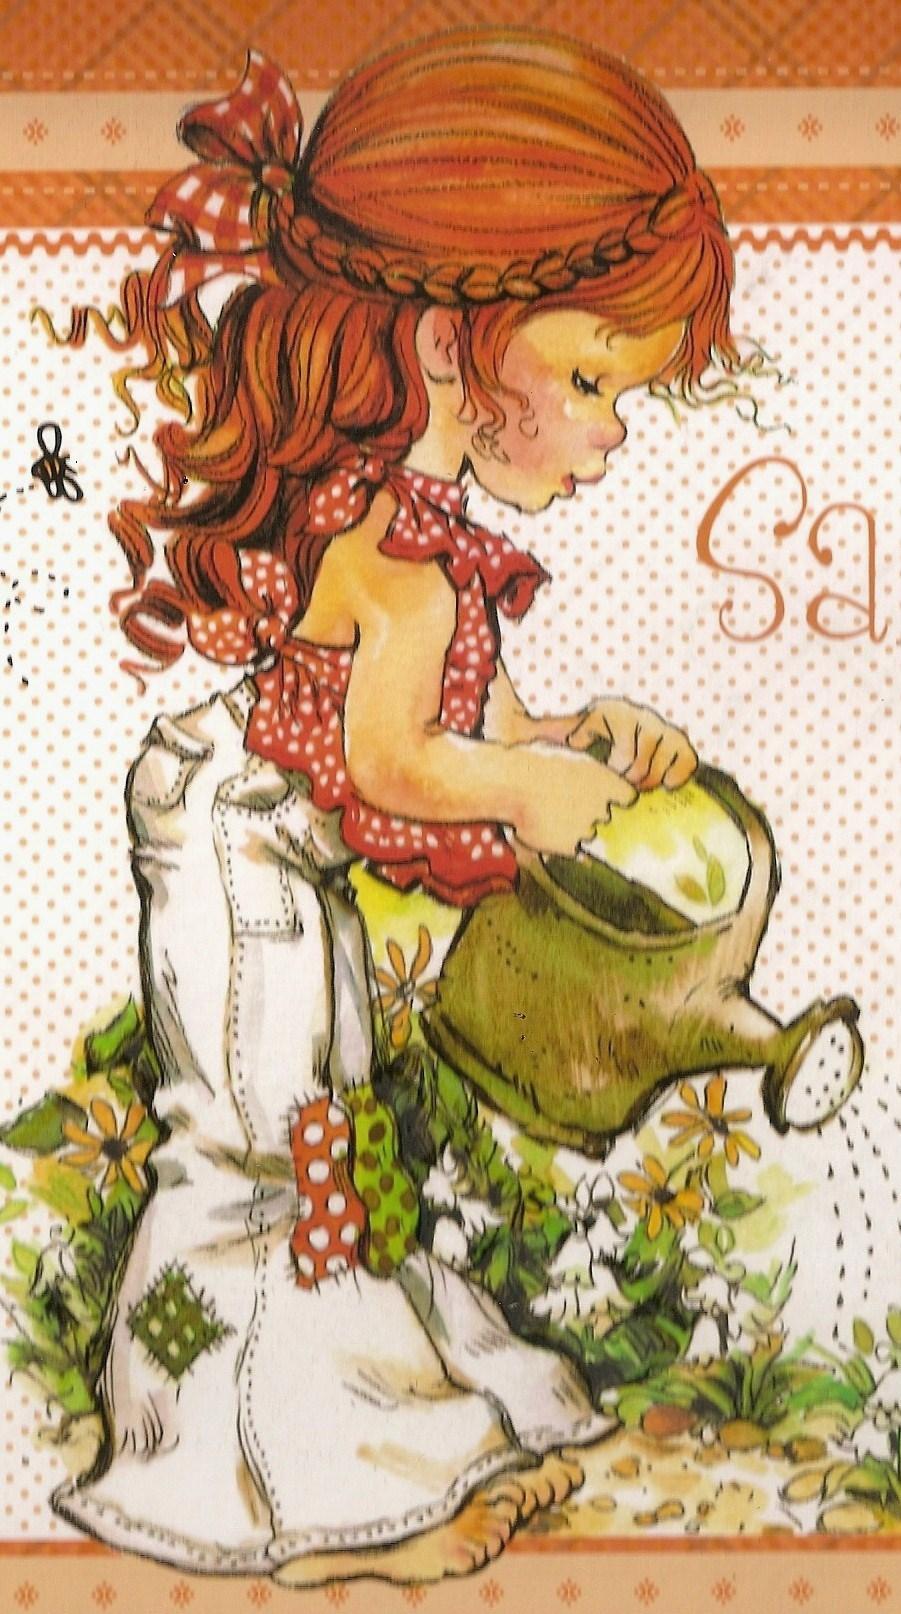 Sarah-Kay-Via-Tracy-wallpaper-wp5003804